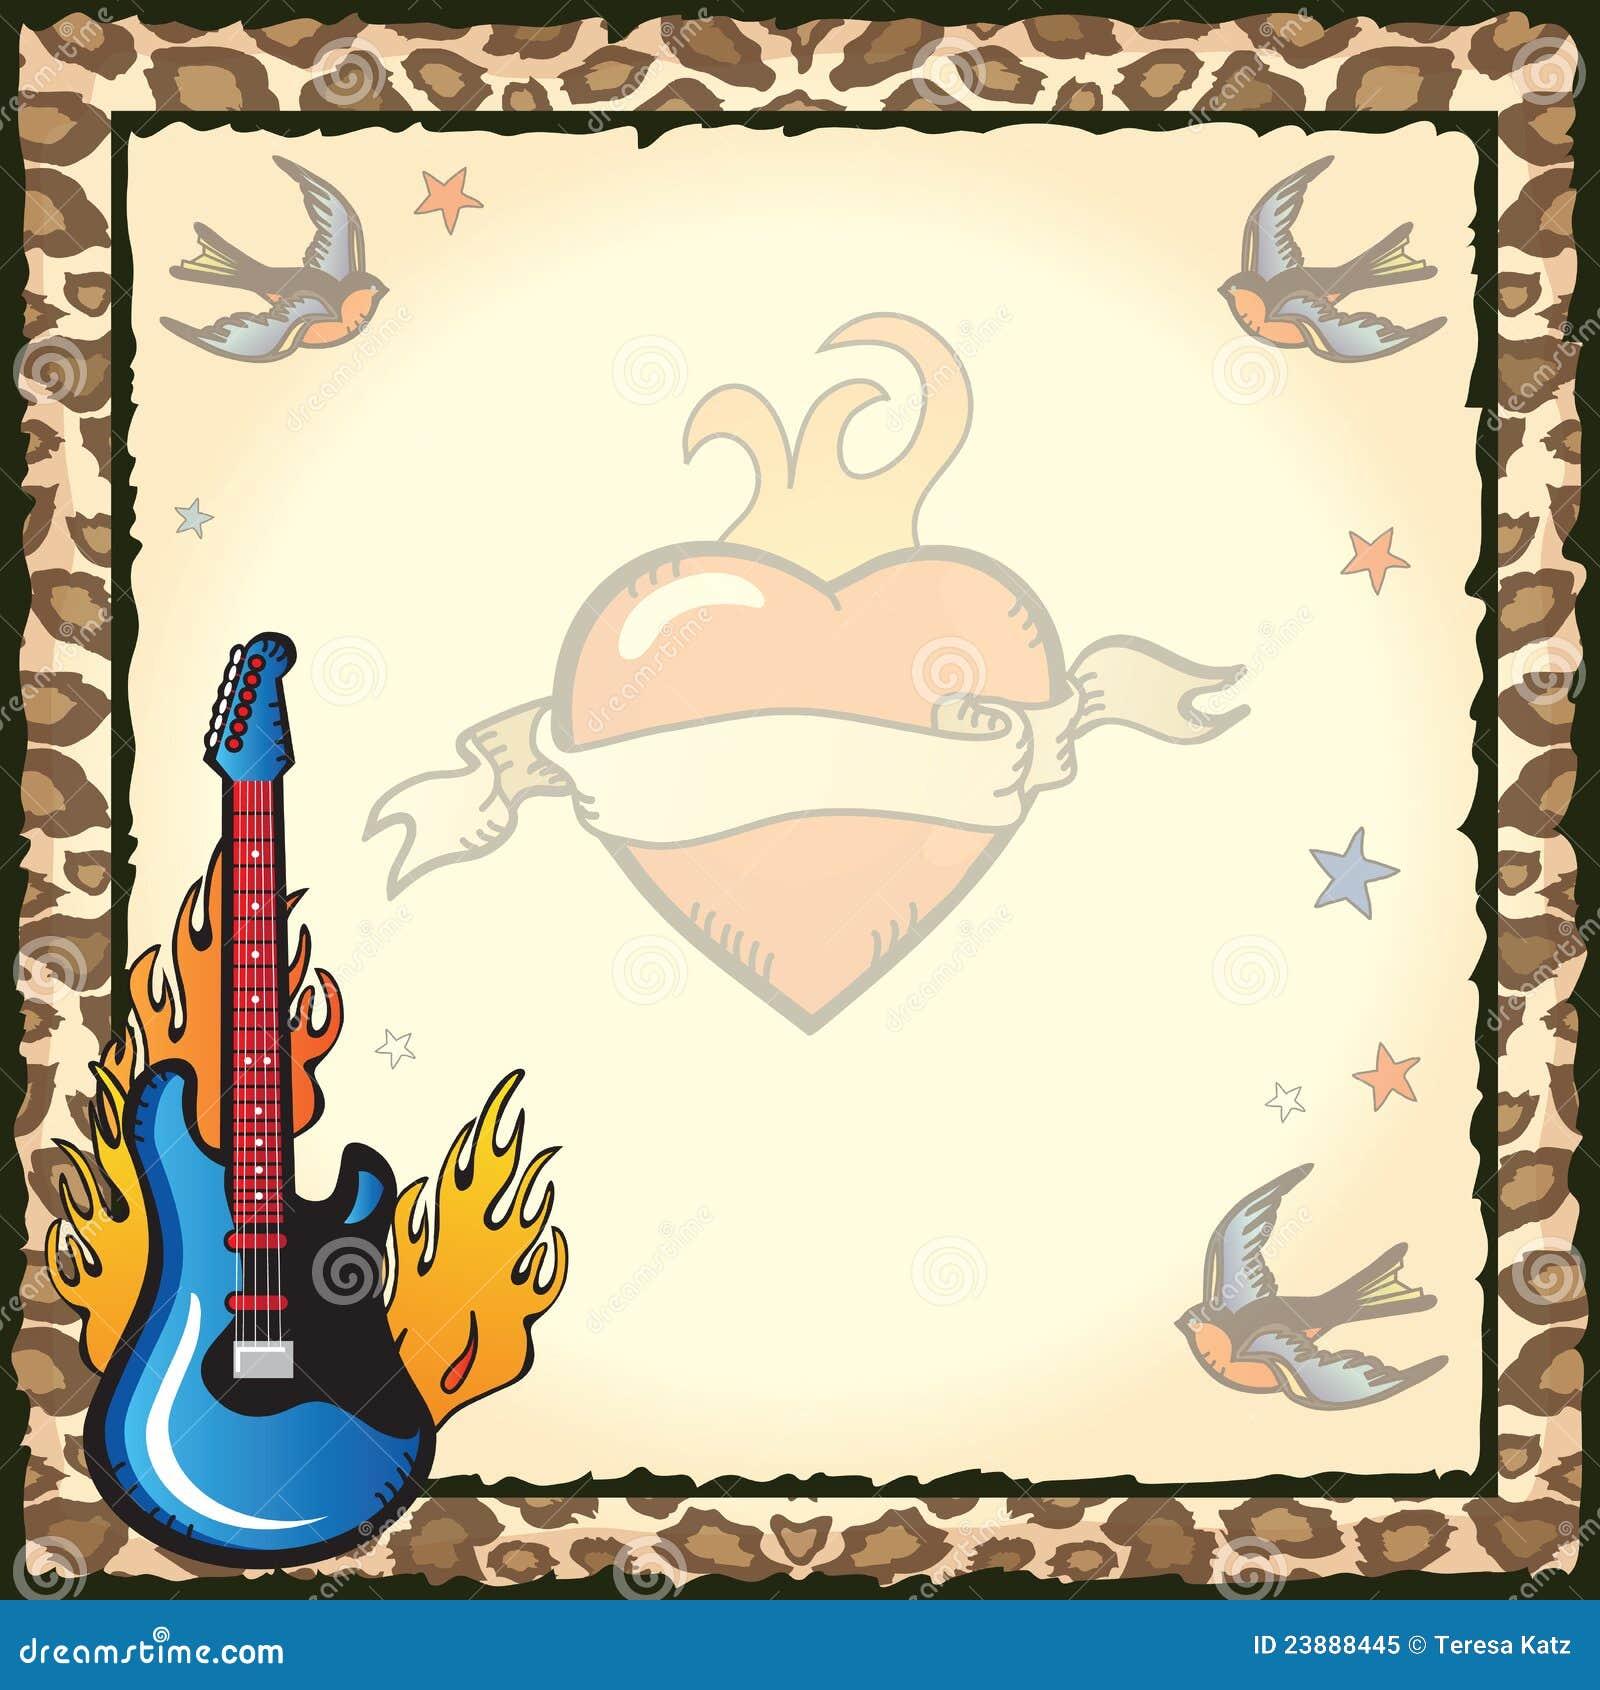 Rock Star Tattoo Party Invitation Stock Vector - Illustration of ...